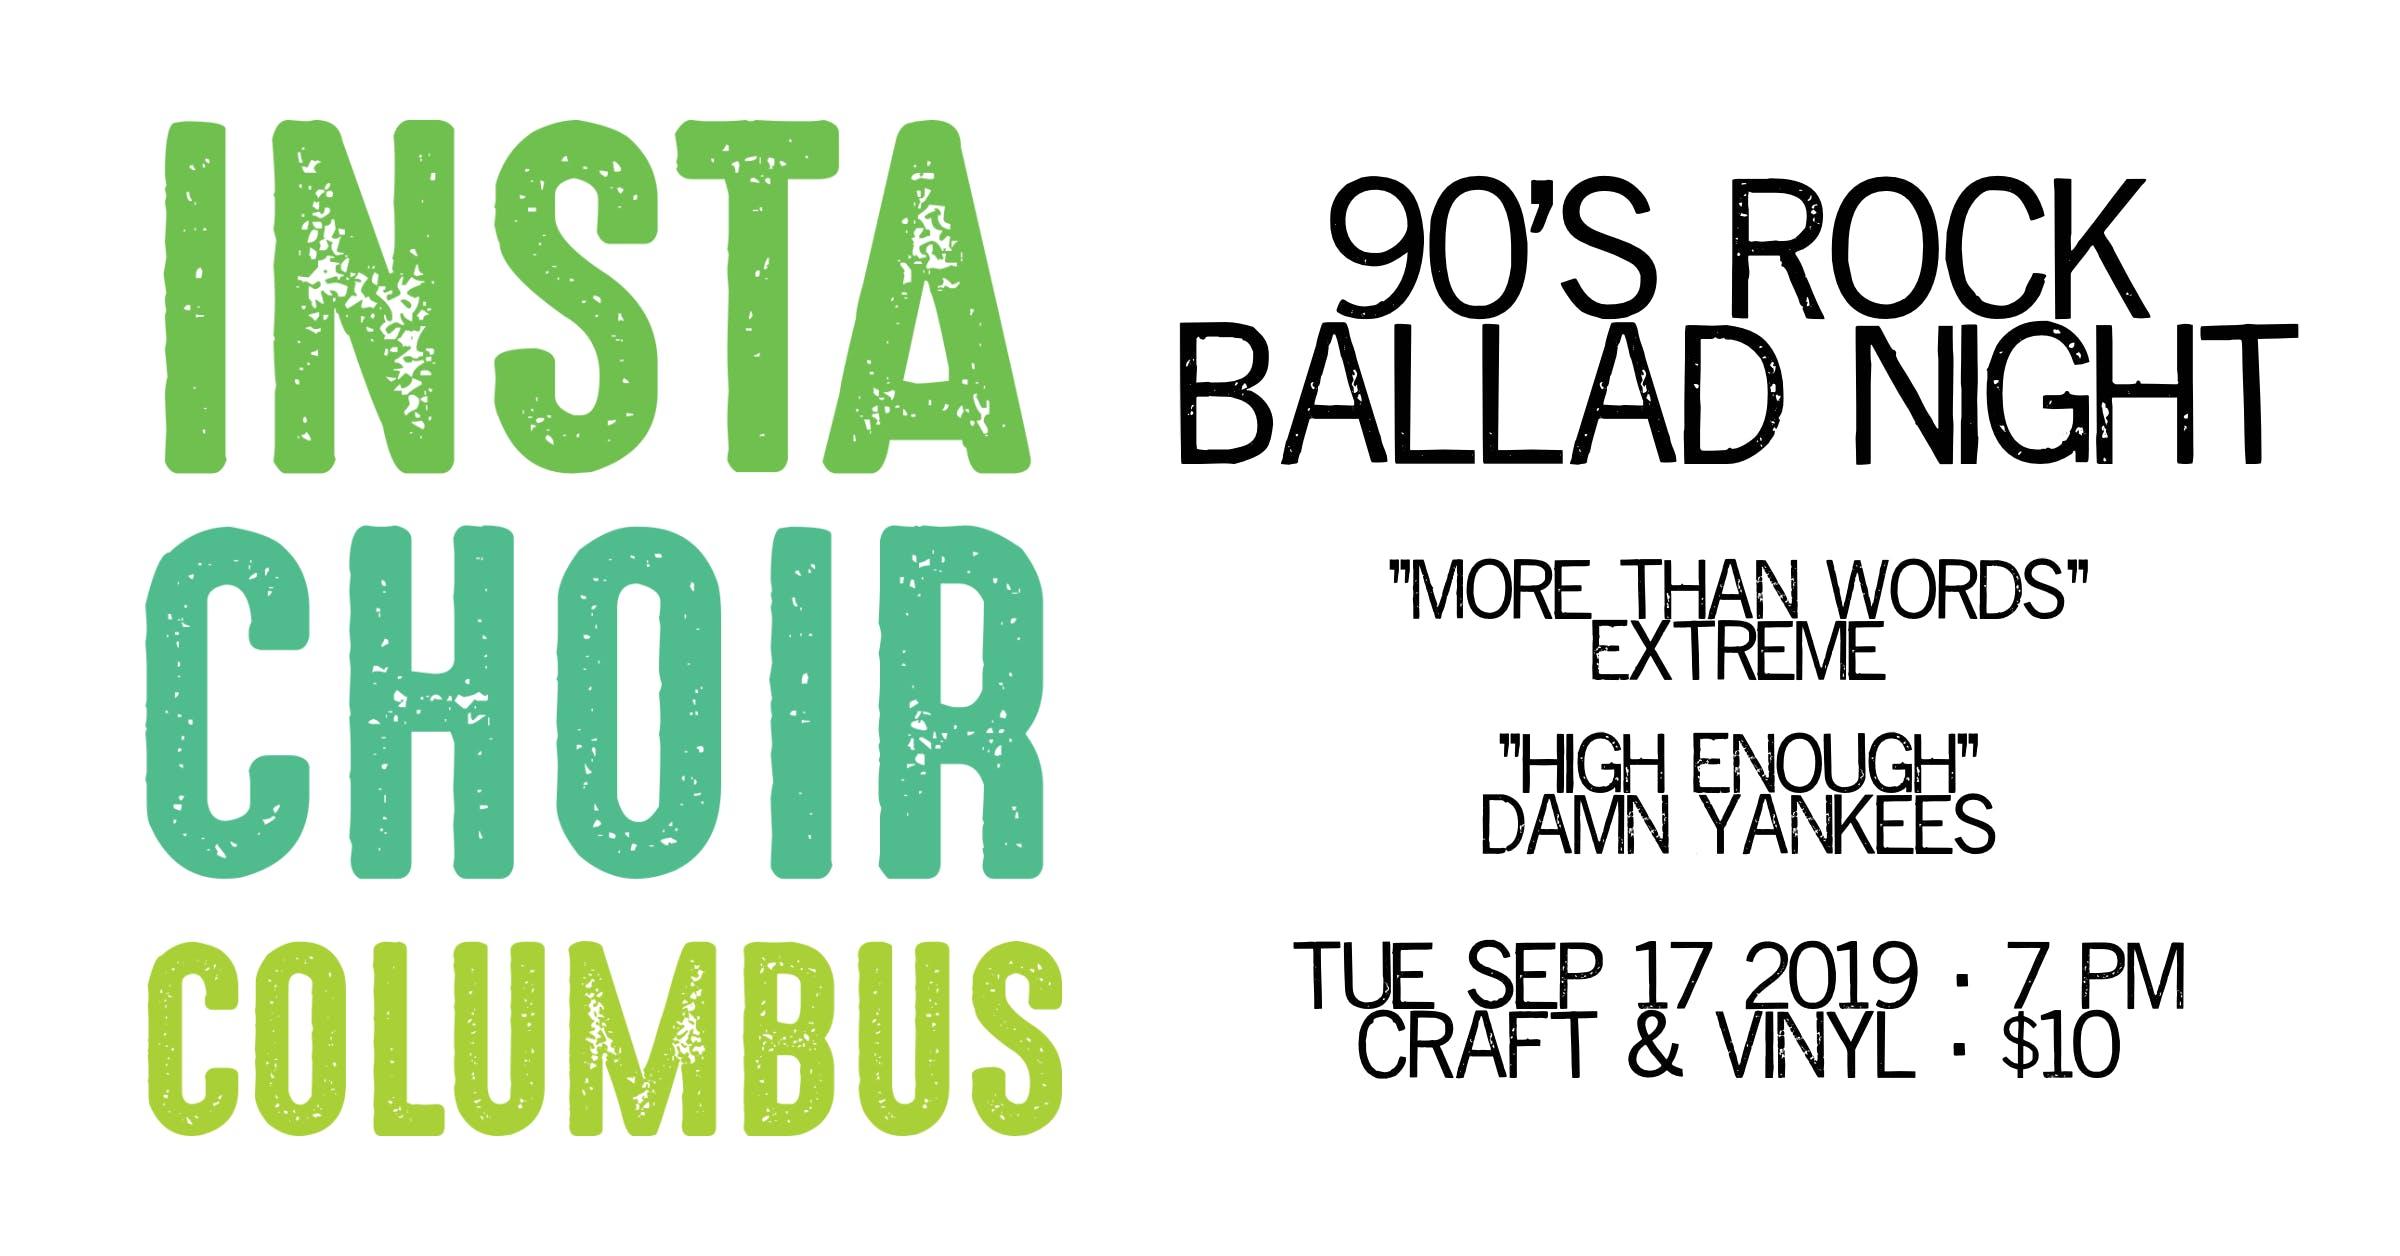 InstaChoir Columbus: 90's Rock Ballad Night